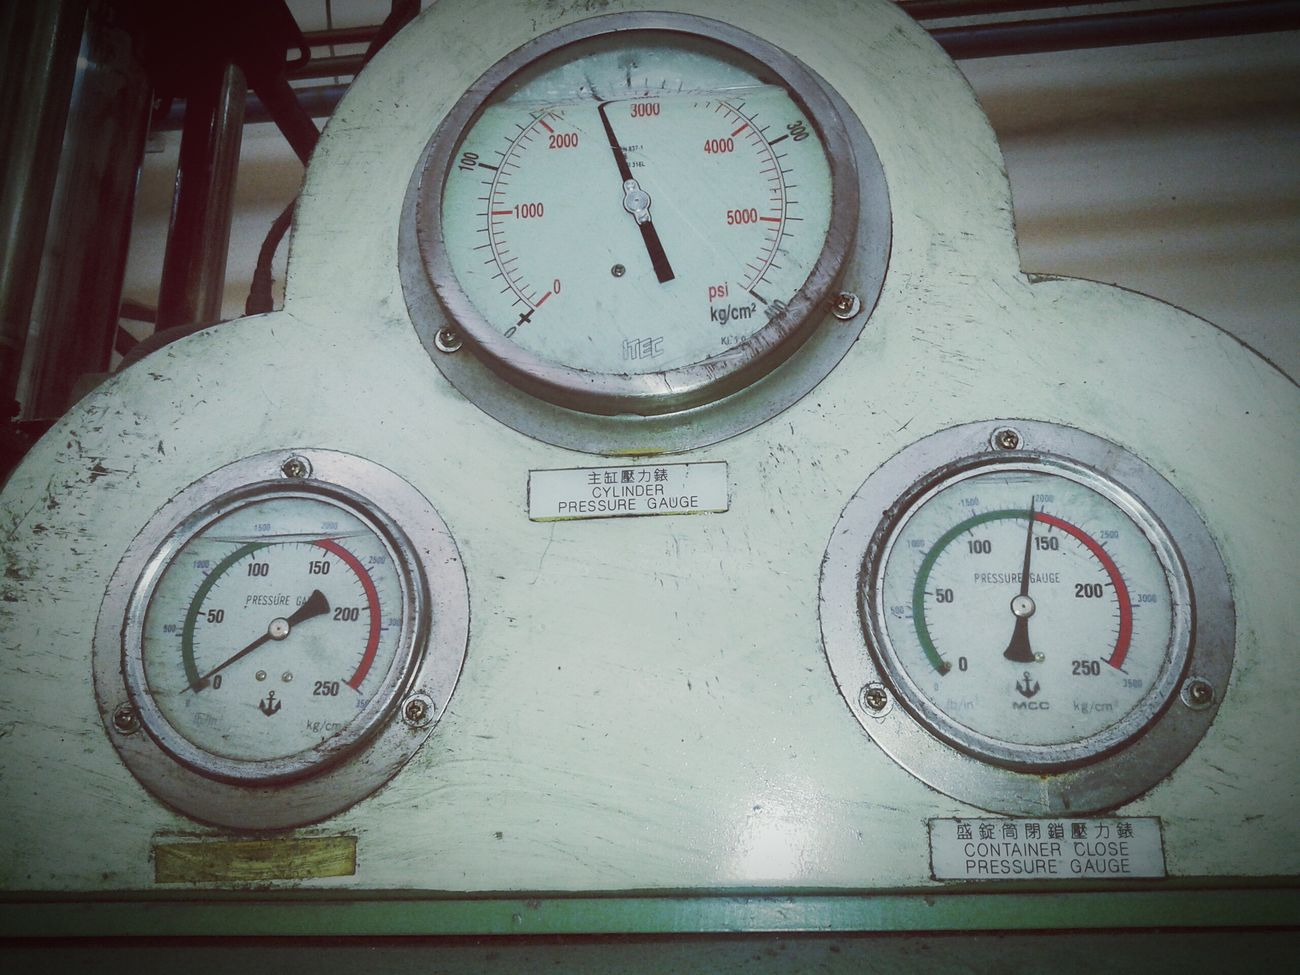 Control Meter - Instrument Of Measurement Technology Work Time Work In Progress Metal Industry No People